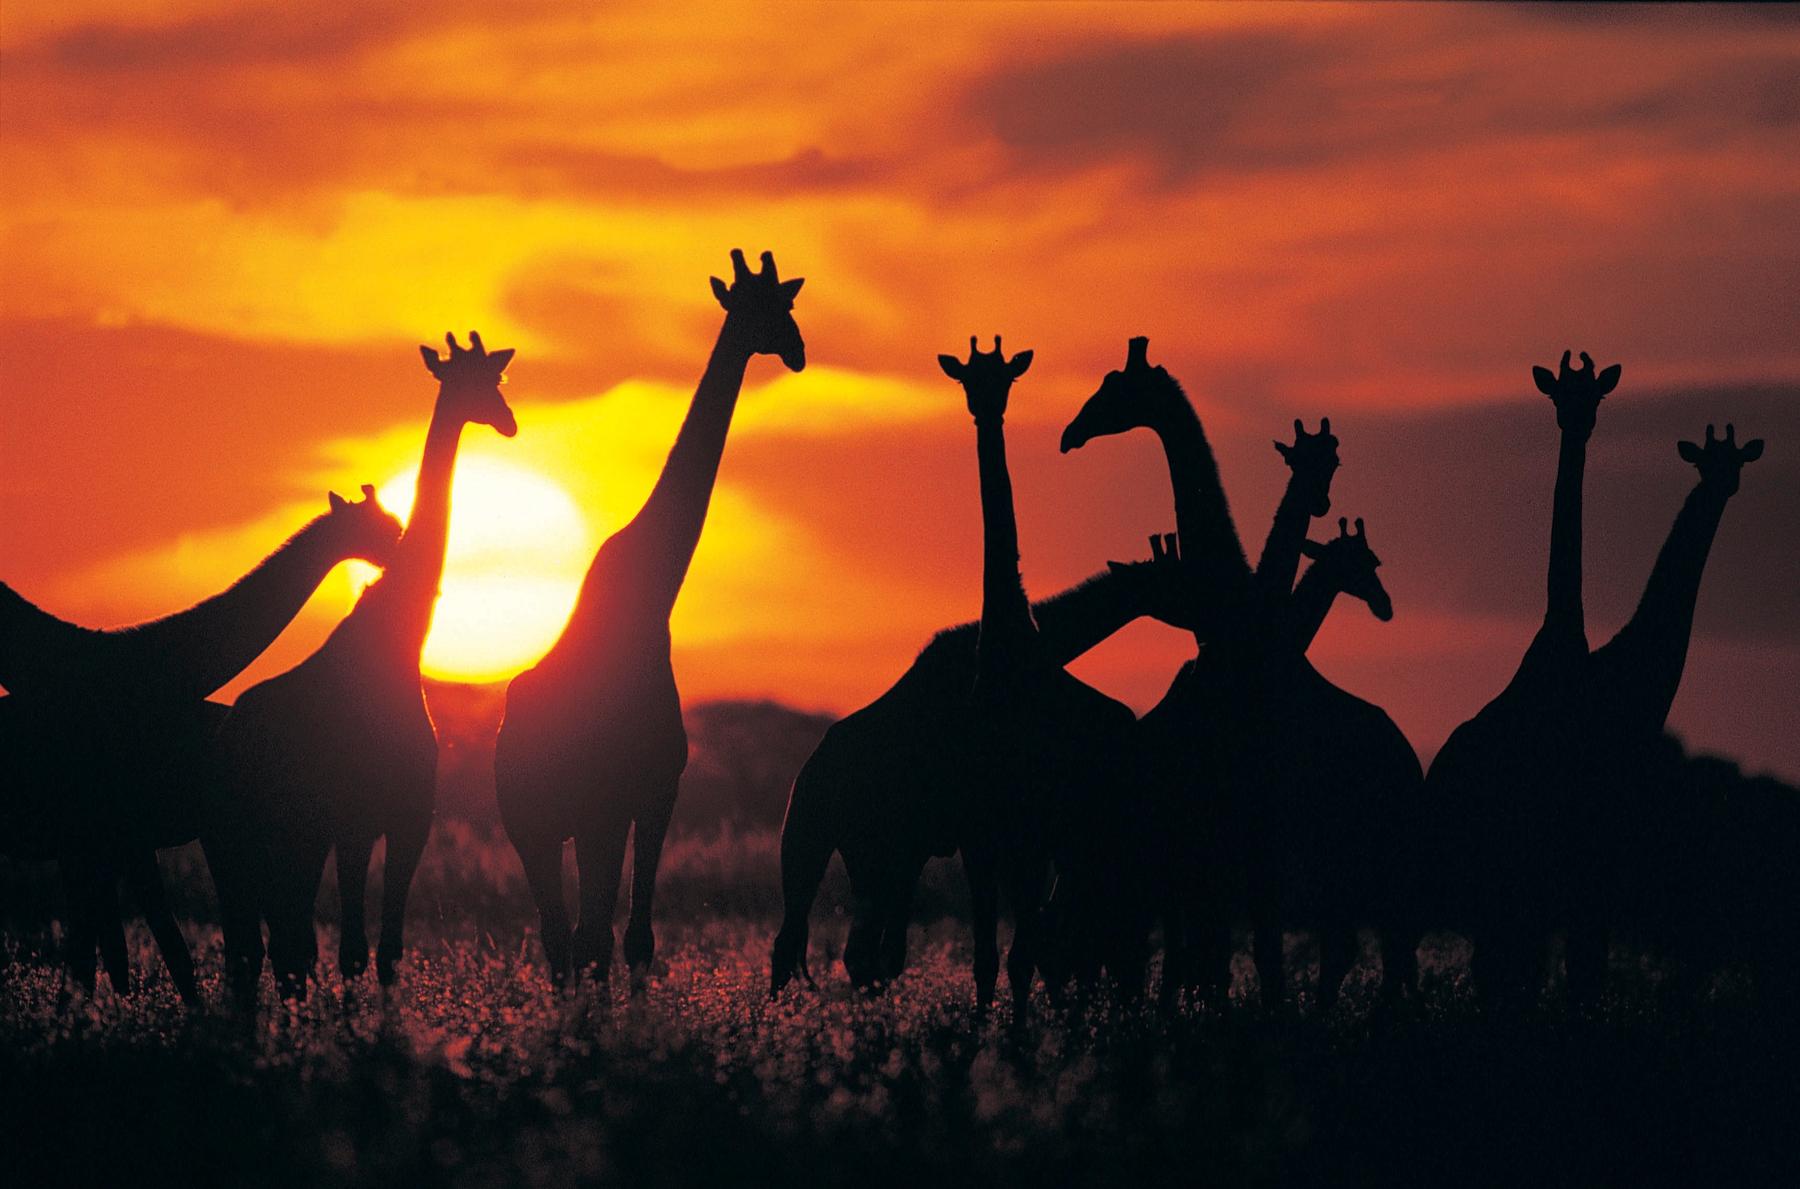 Herd of giraffes in Botswana at sunset